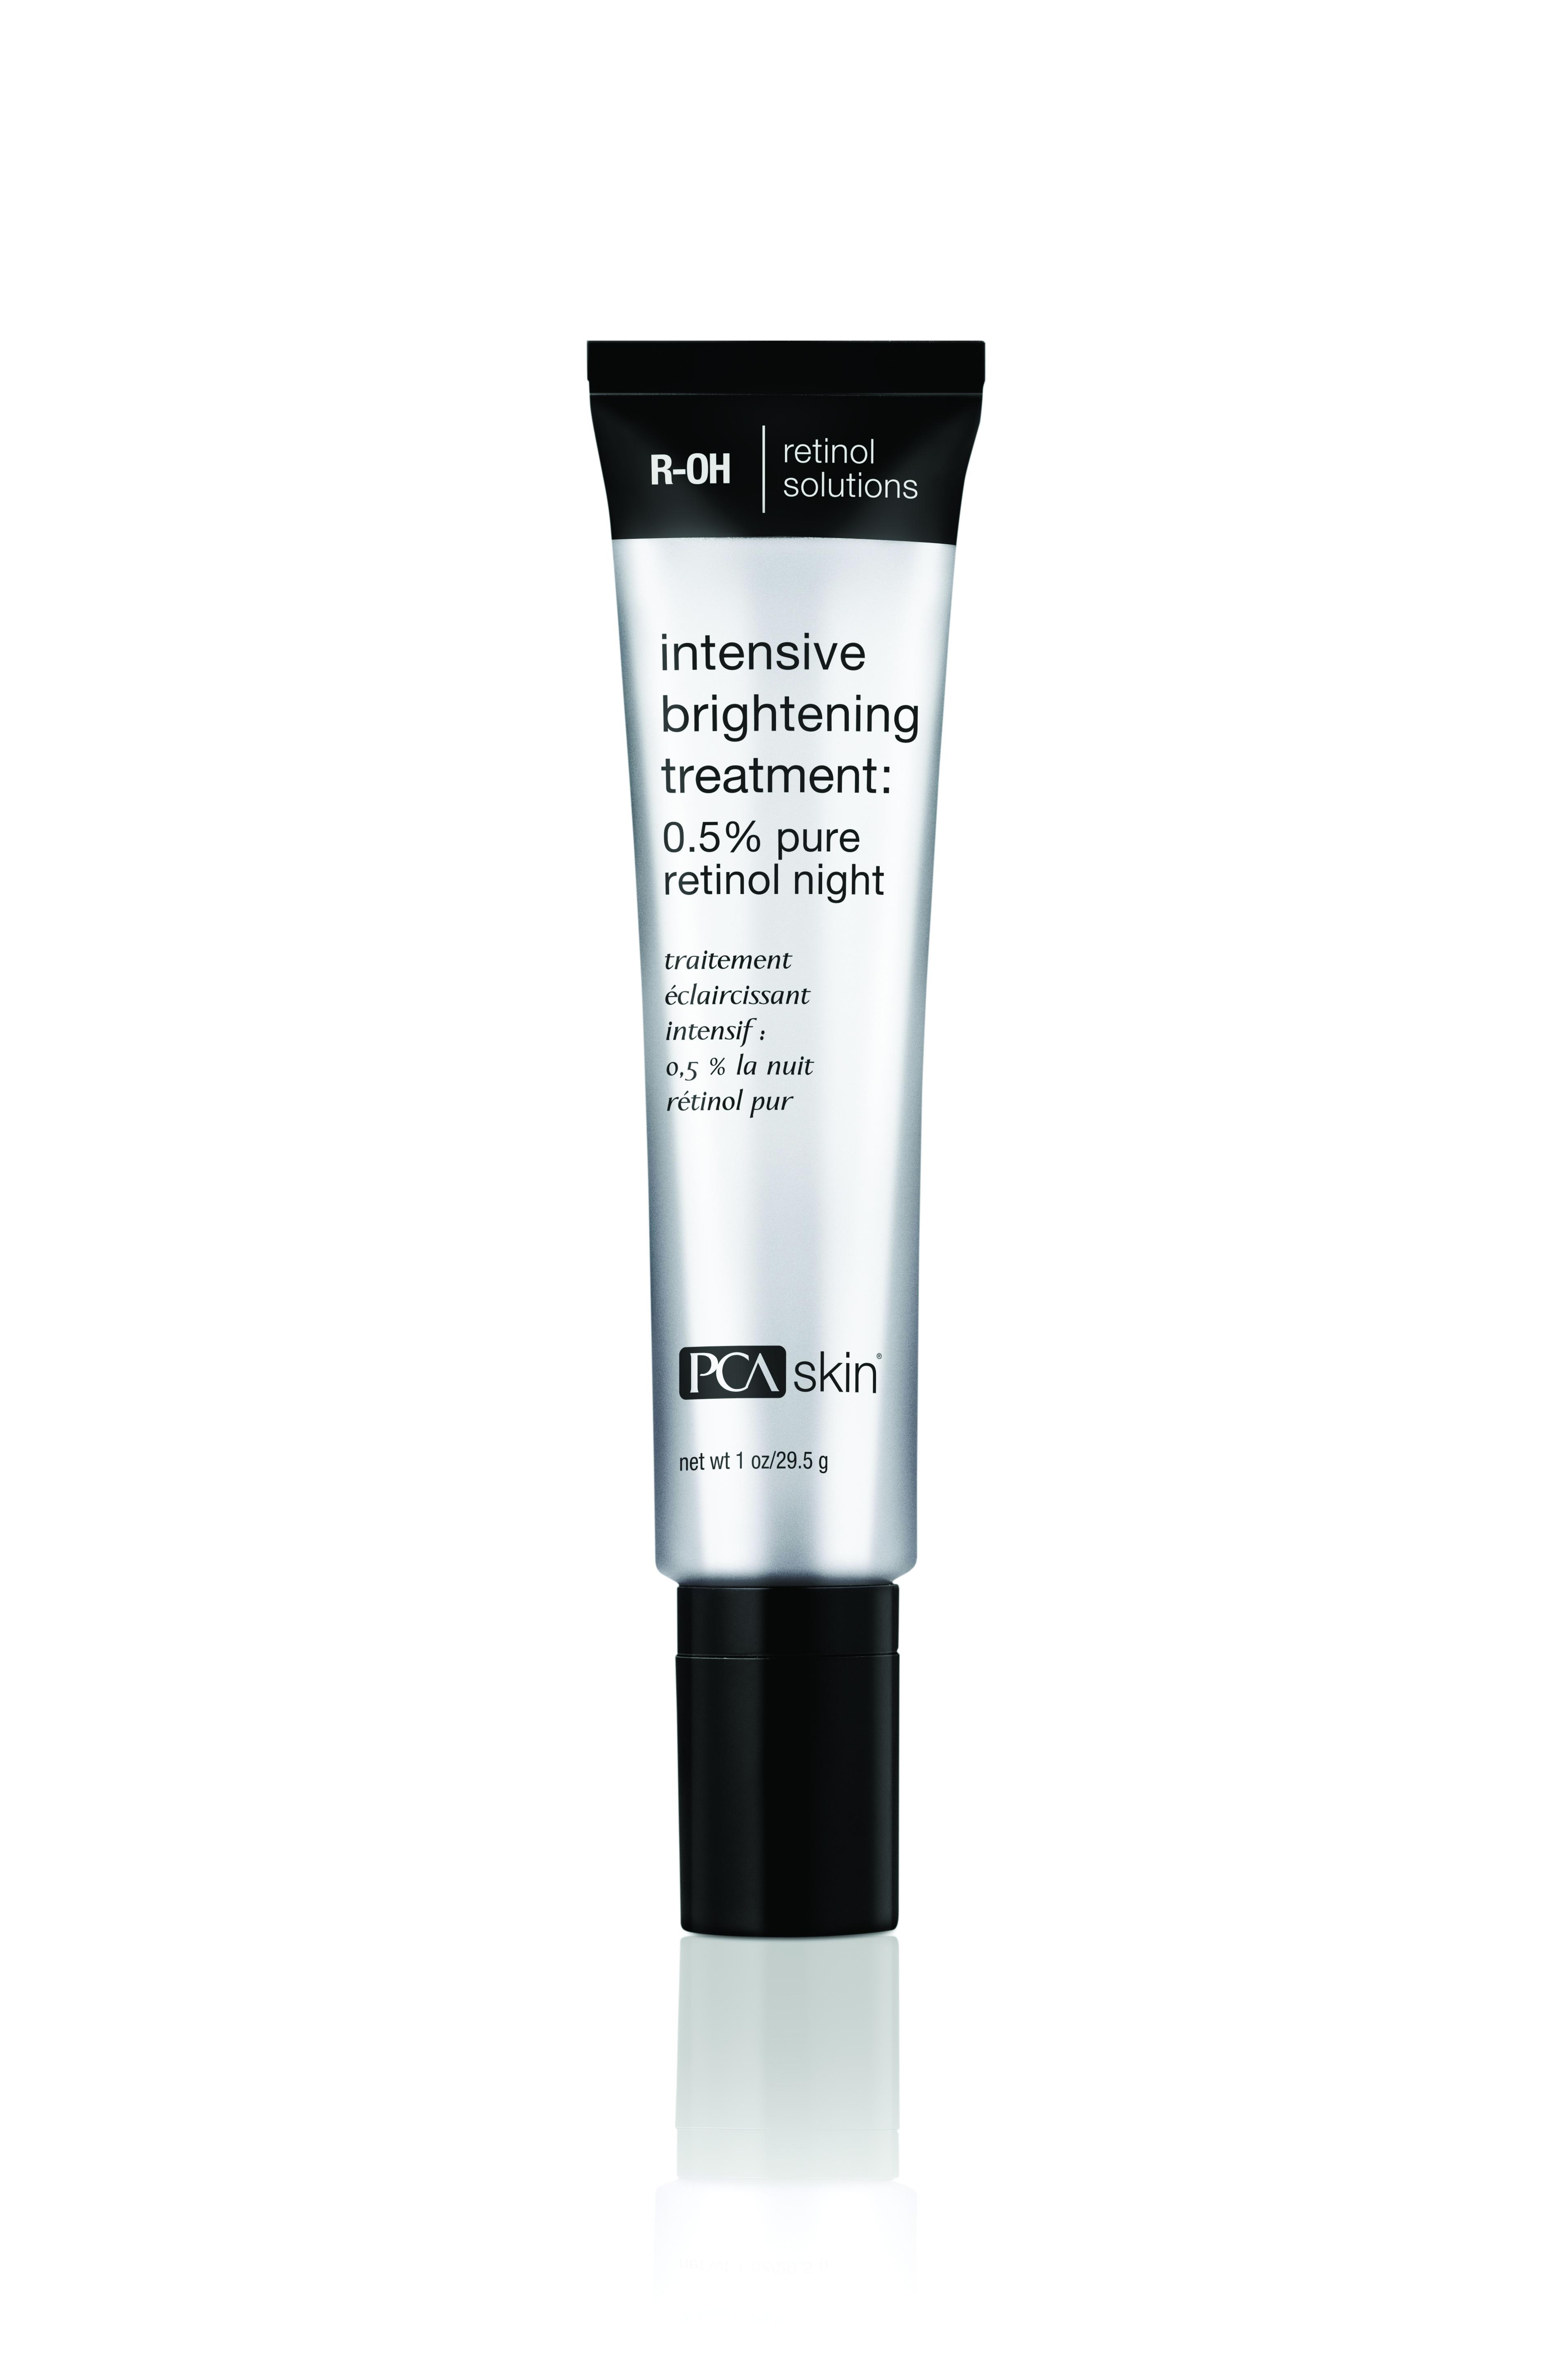 PCA skin brightening treatment